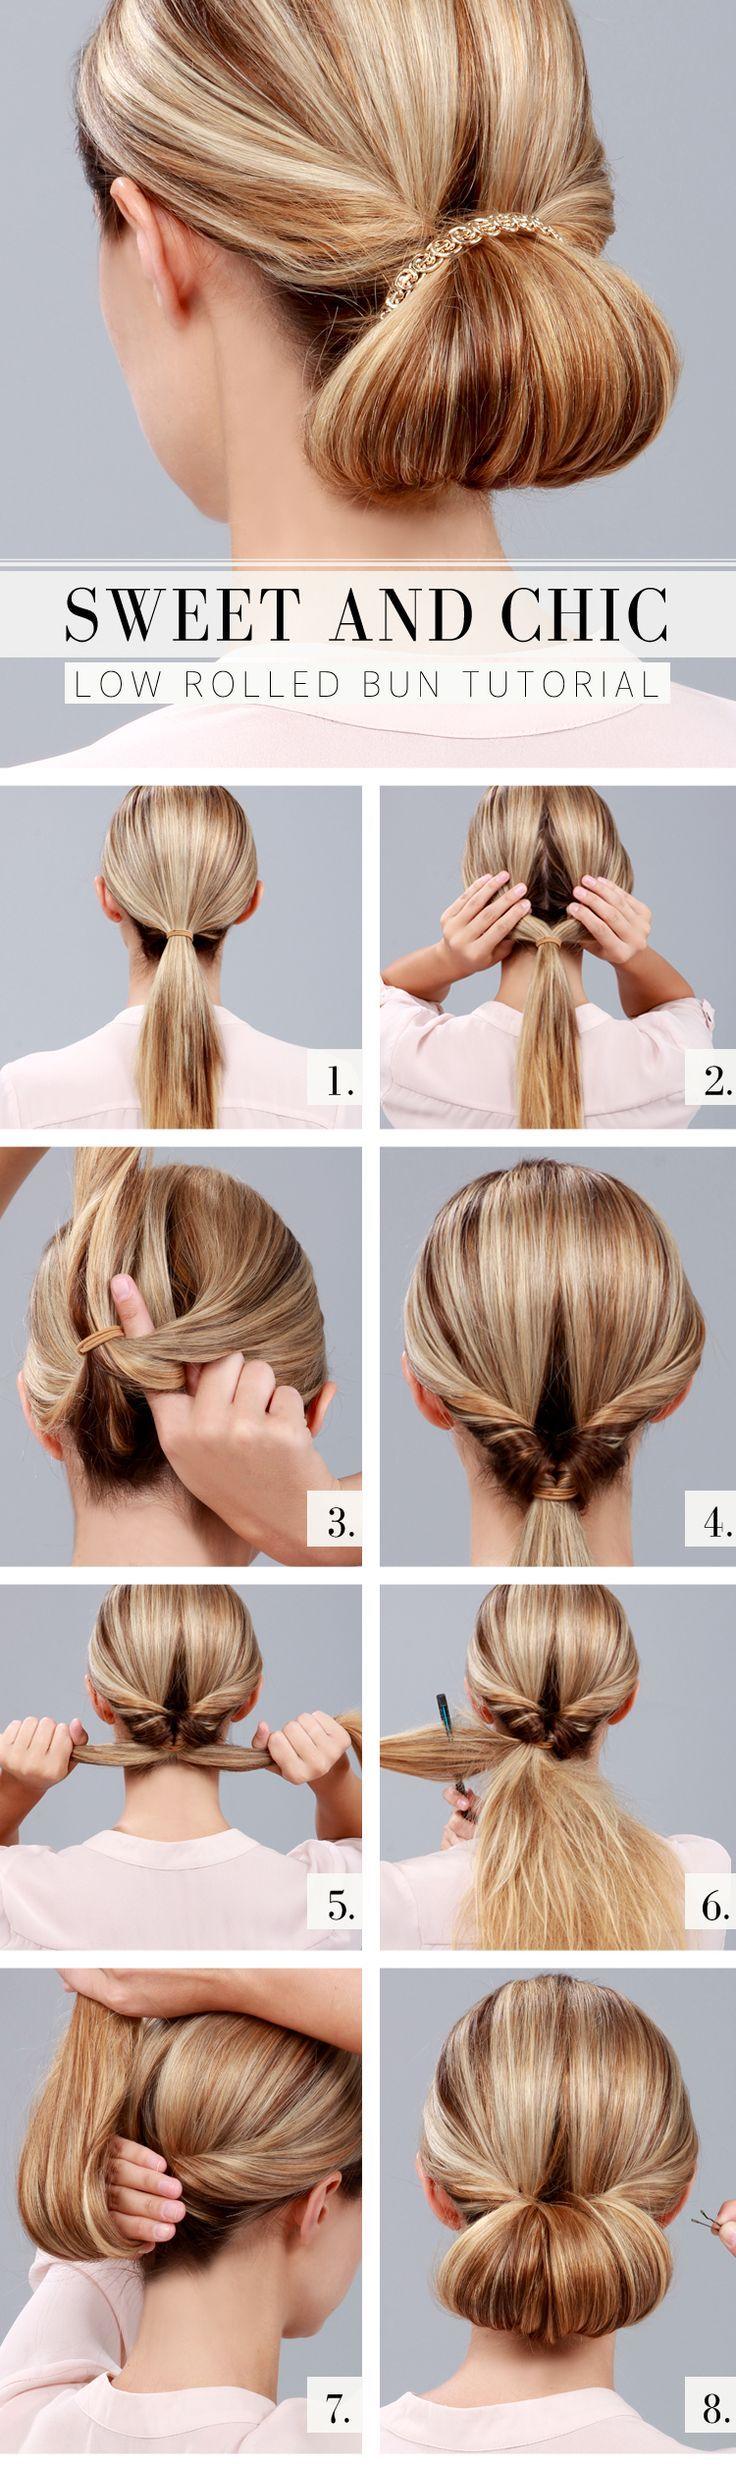 Stupendous 1000 Ideas About Low Bun Tutorials On Pinterest Bun Tutorials Short Hairstyles Gunalazisus